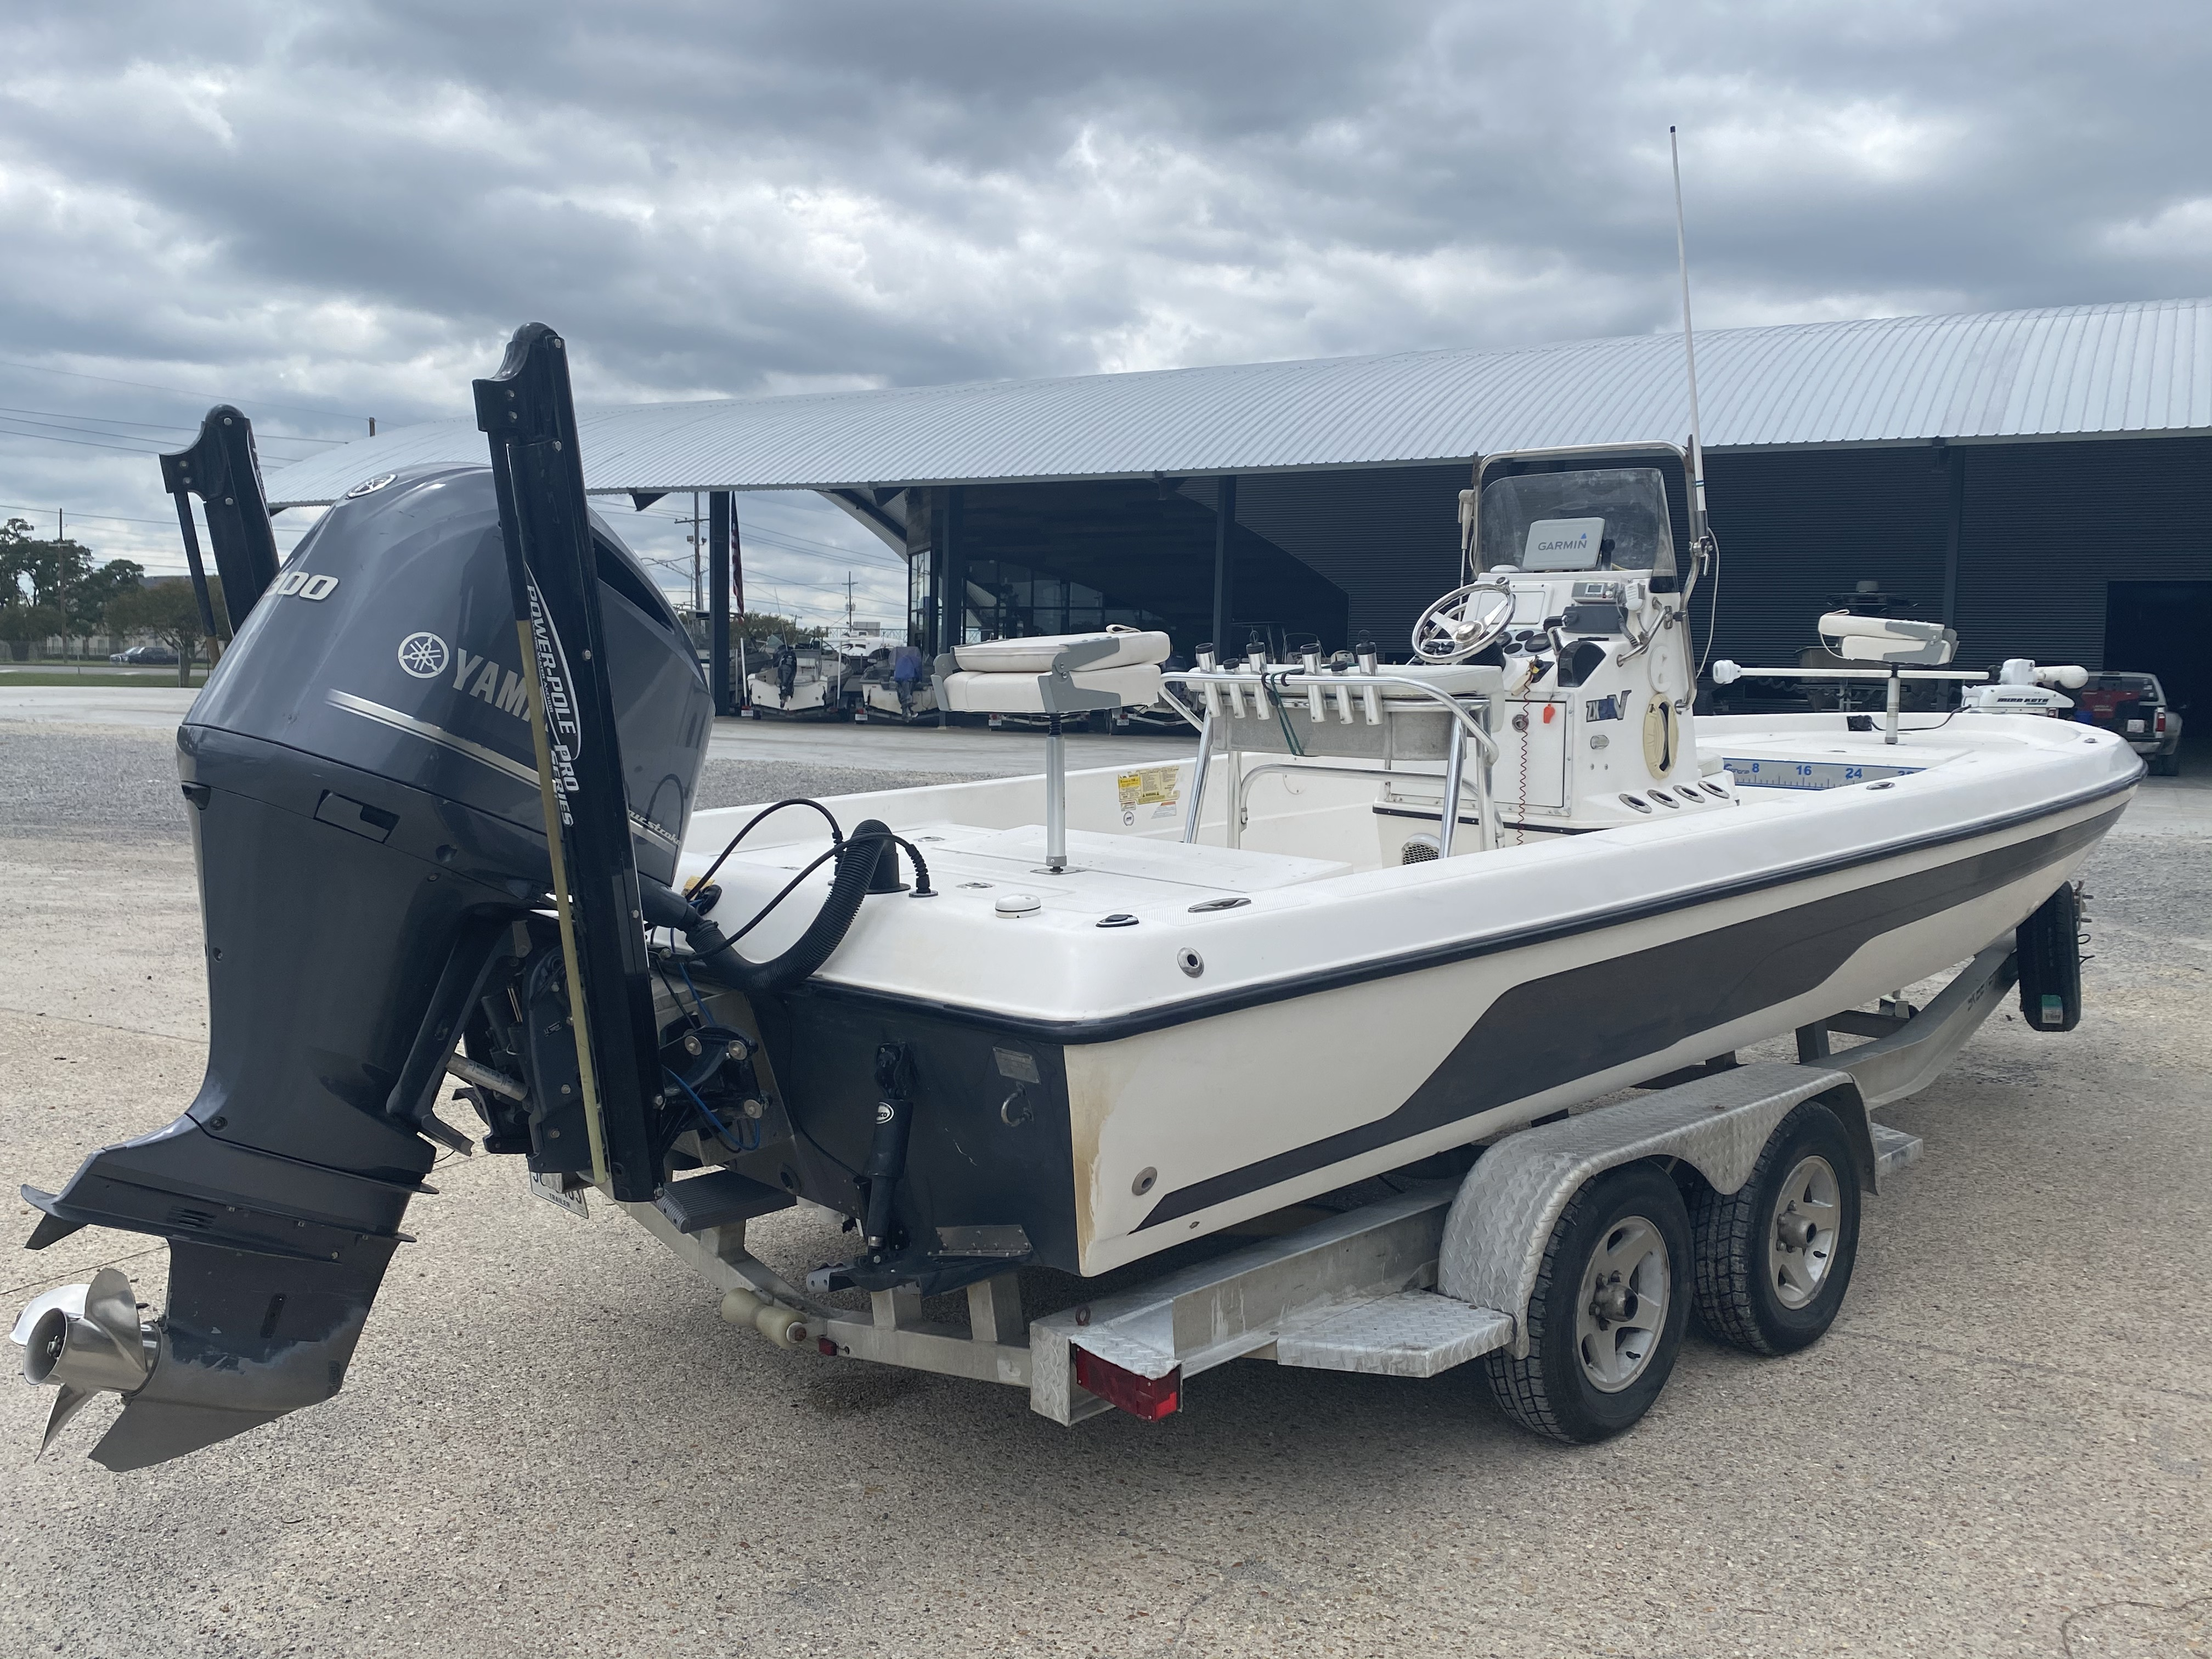 2010 Skeeter boat for sale, model of the boat is ZX 24V & Image # 6 of 18